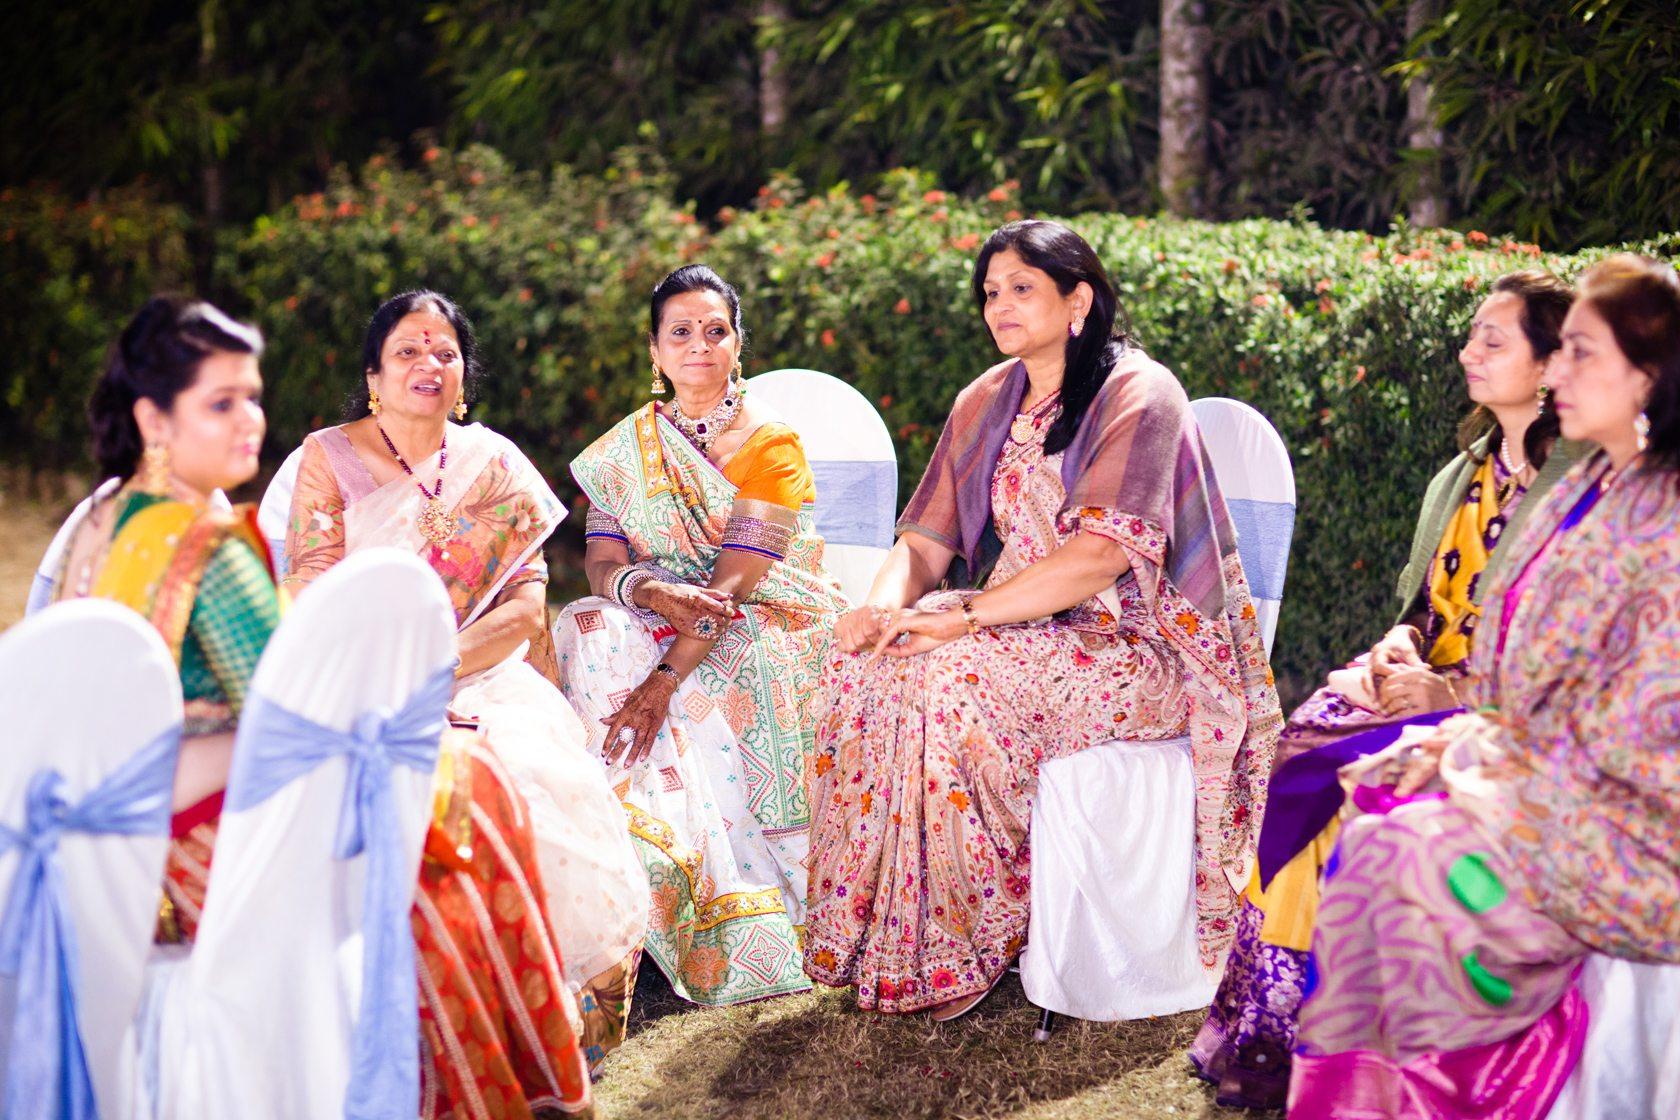 India_Wedding_133.jpg